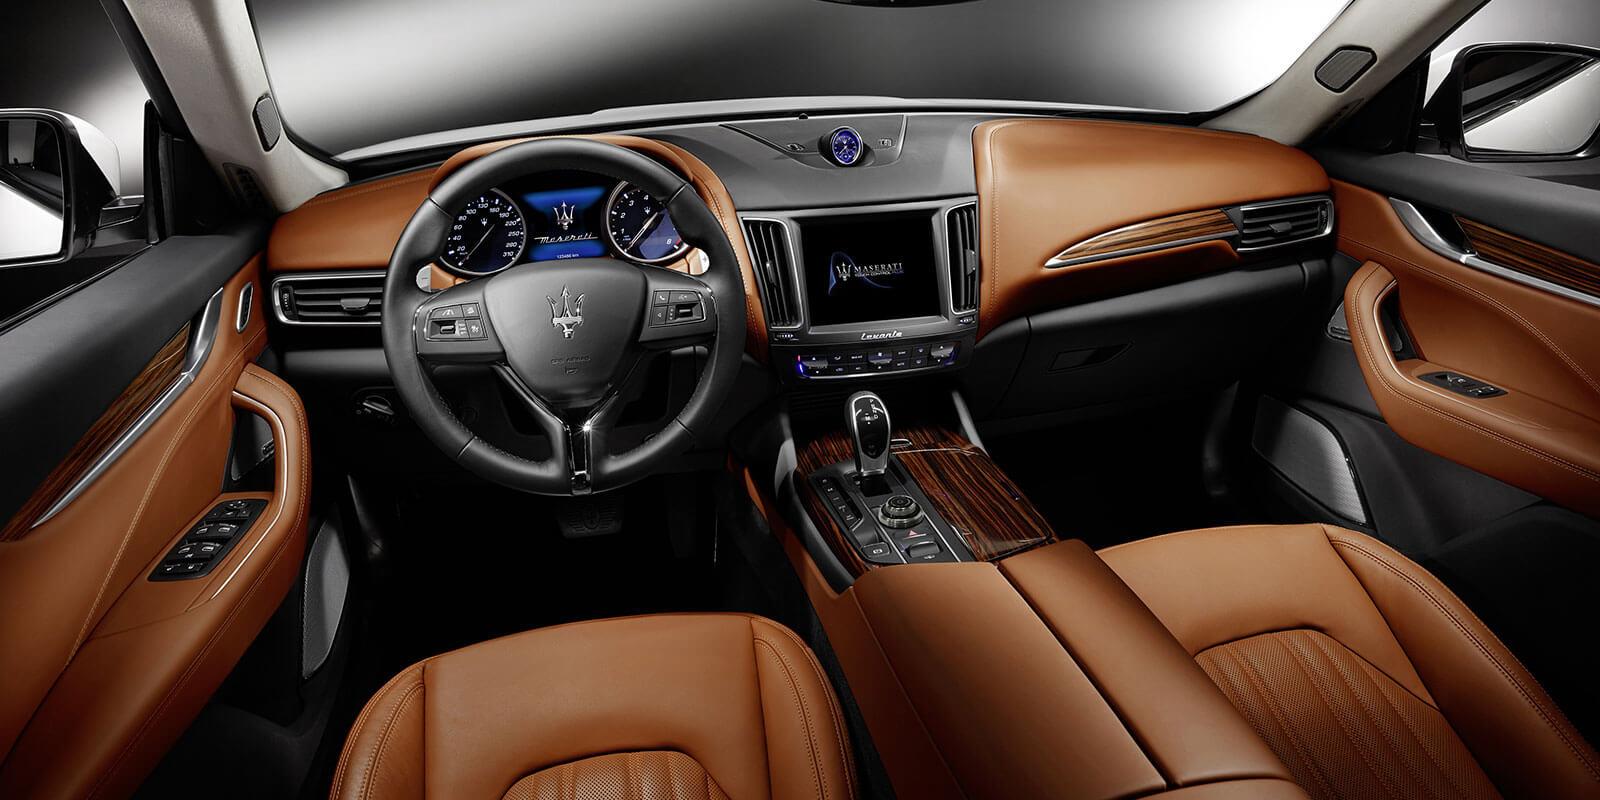 2017 Crossover Suv Interior >> Segment Analysis: Maserati Levante - GoAutoNews Premium